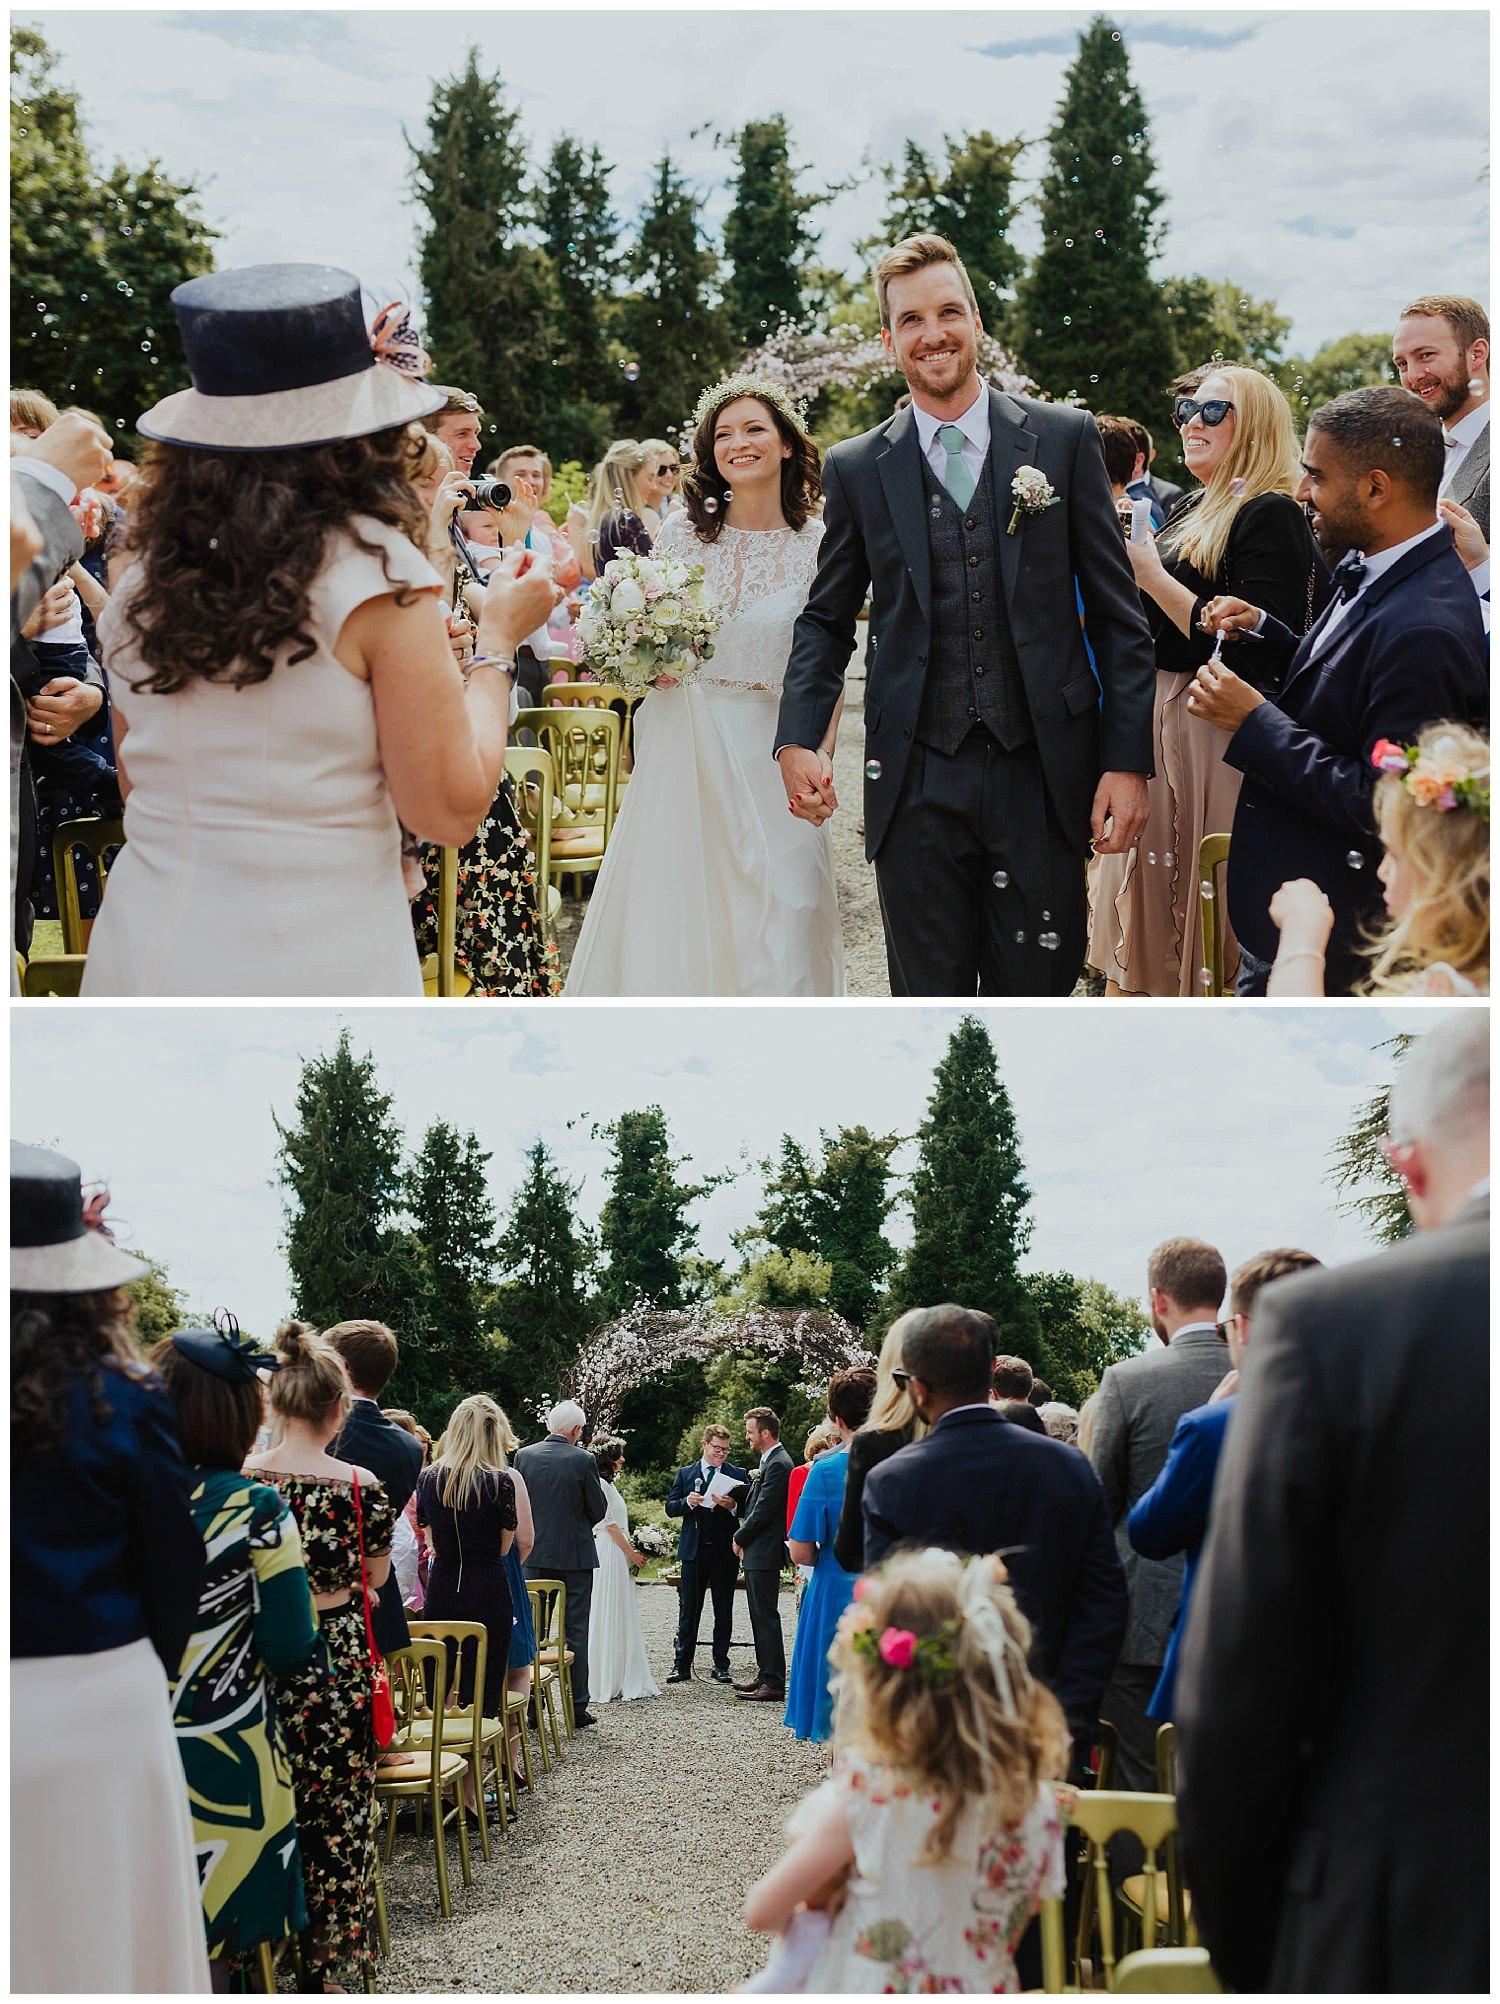 temple_house_sligo_wedding_photograher_10.jpg